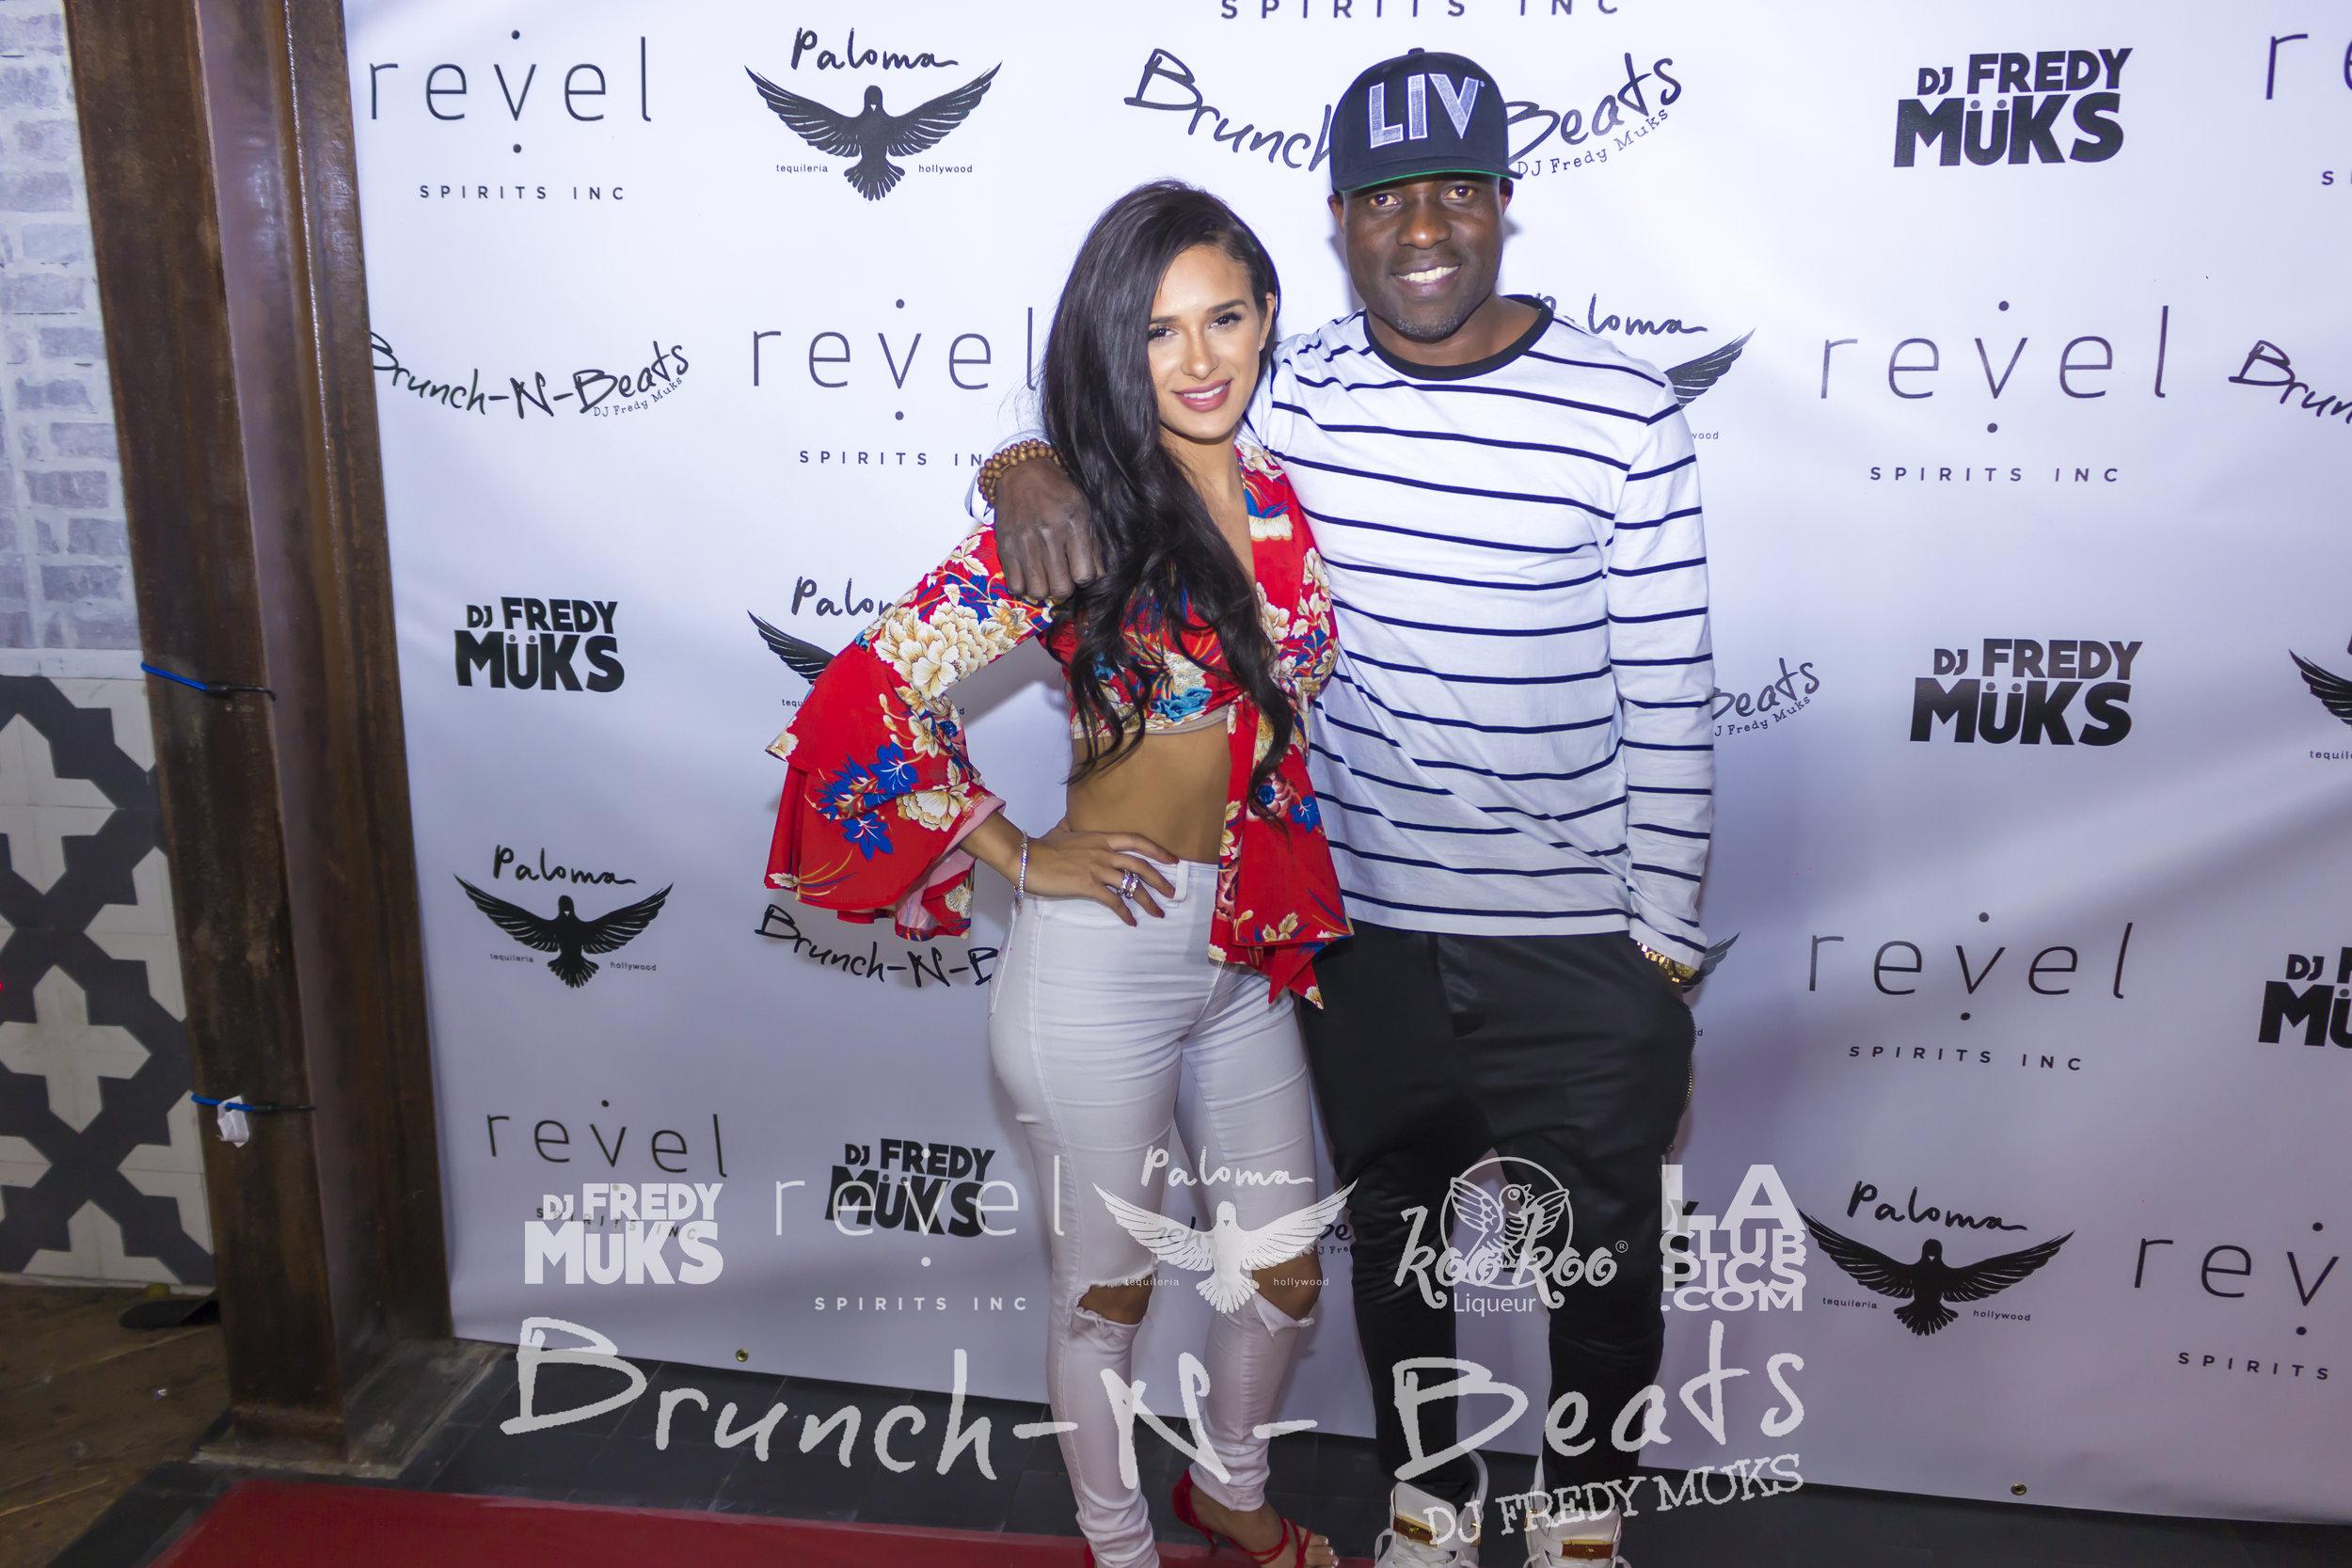 Brunch-N-Beats - Paloma Hollywood - 02-25-18_244.jpg